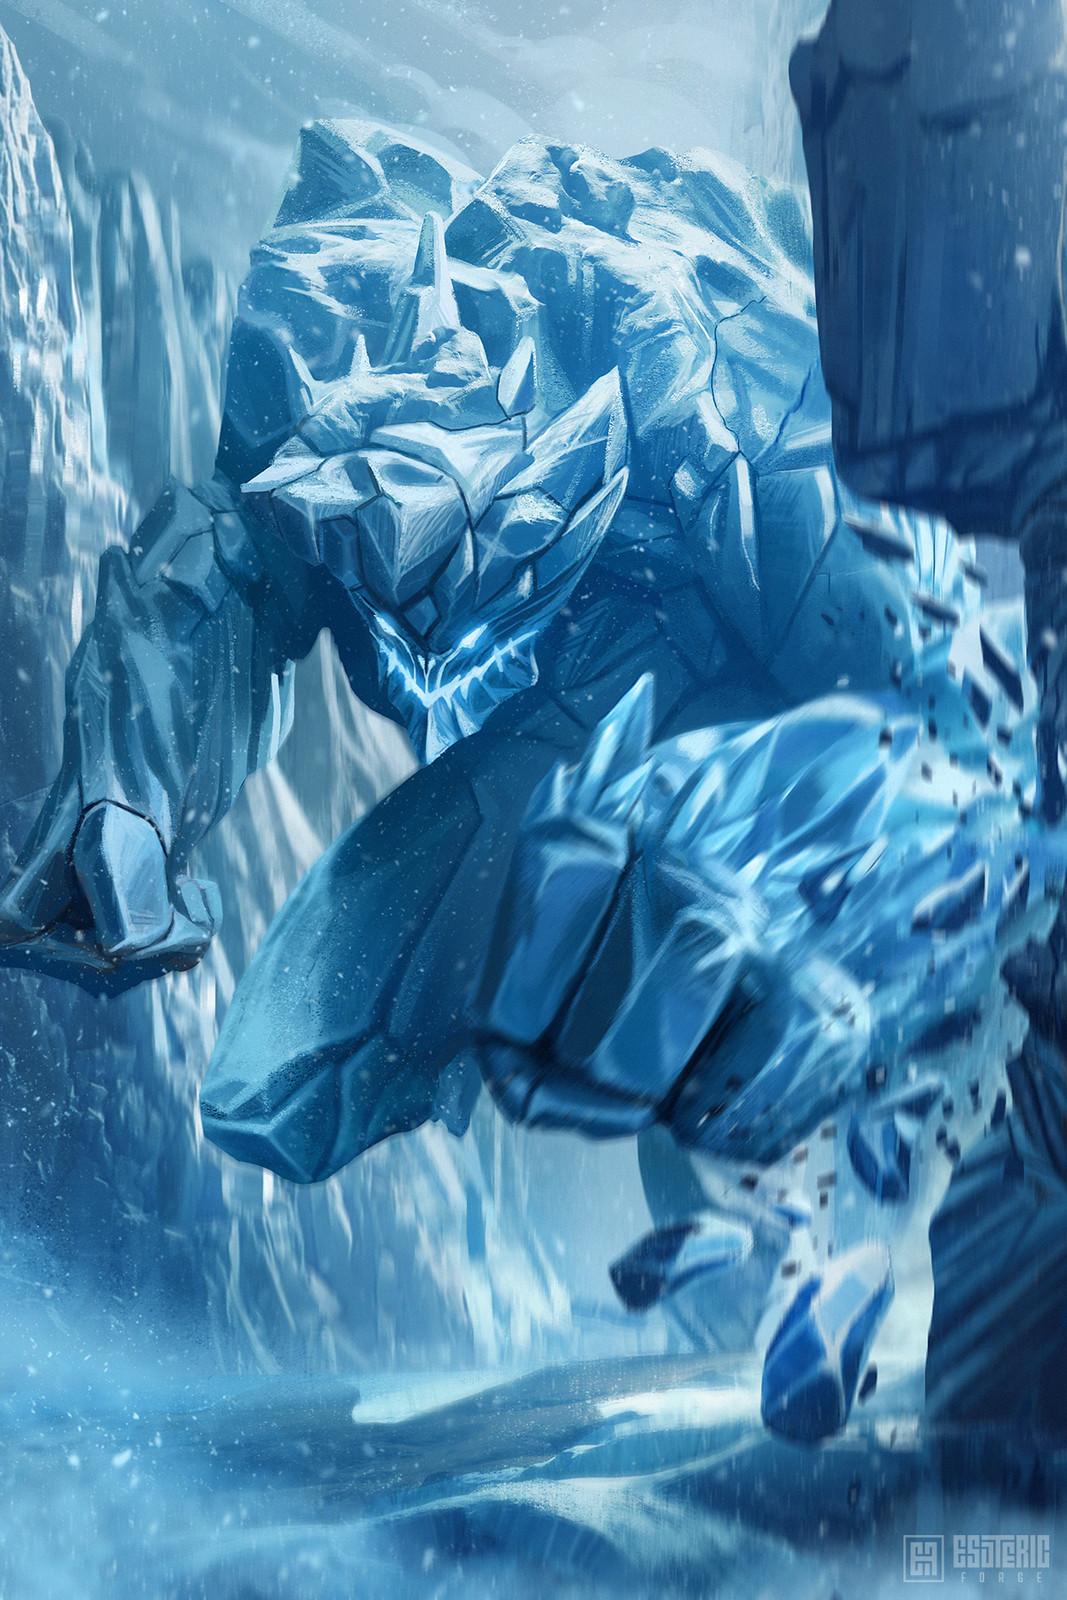 ivan-sevic-ice-golem.jpg